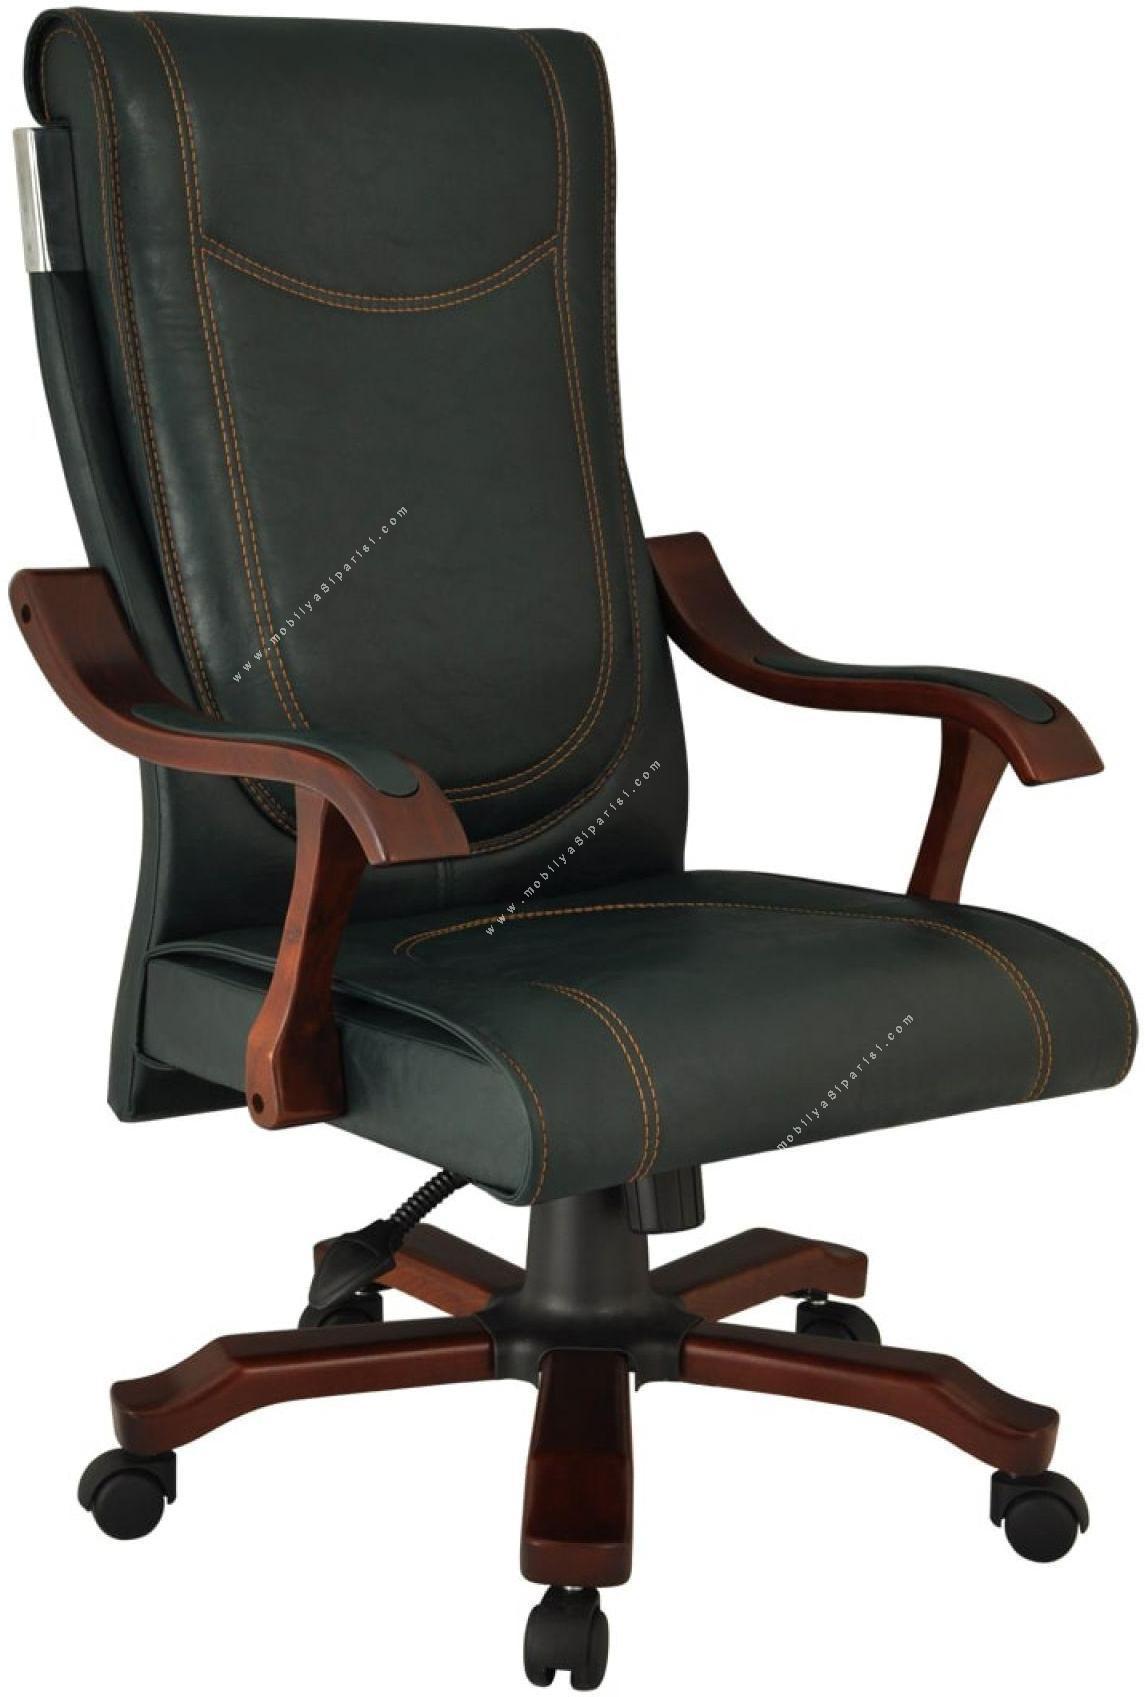 koren ahşap makam koltuğu